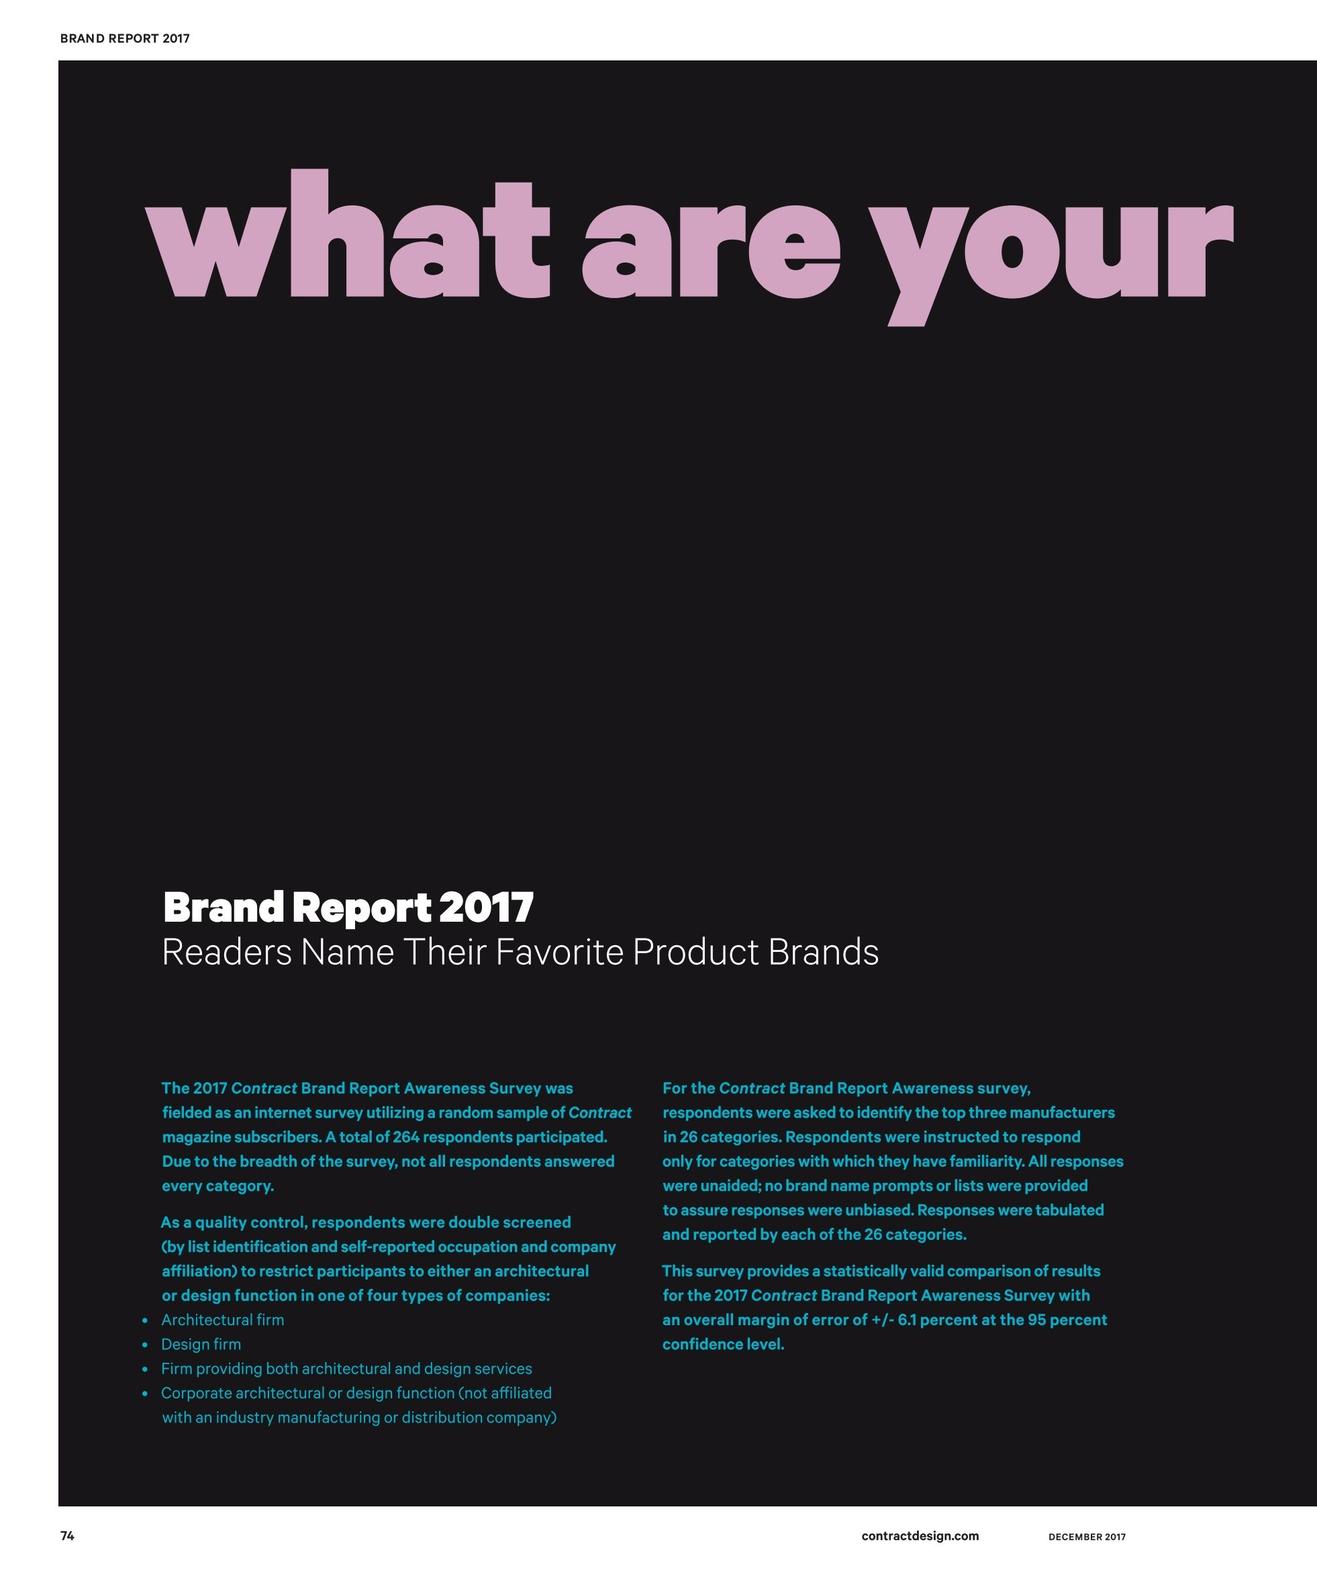 Contract Magazine - December 2017